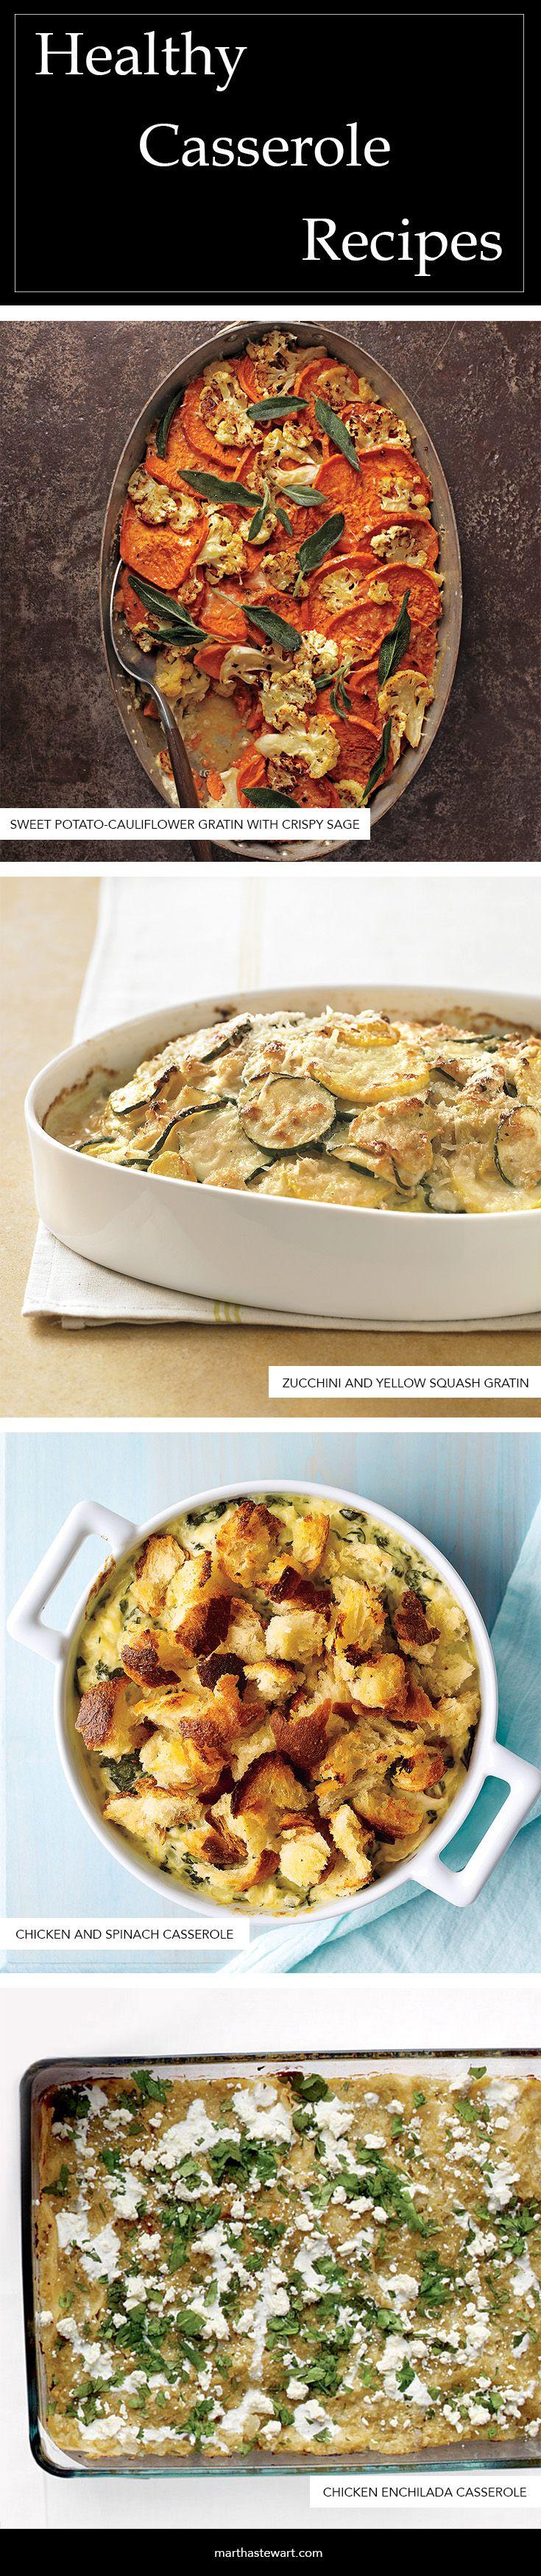 Healthy Casserole Recipes | Martha Stewart Living